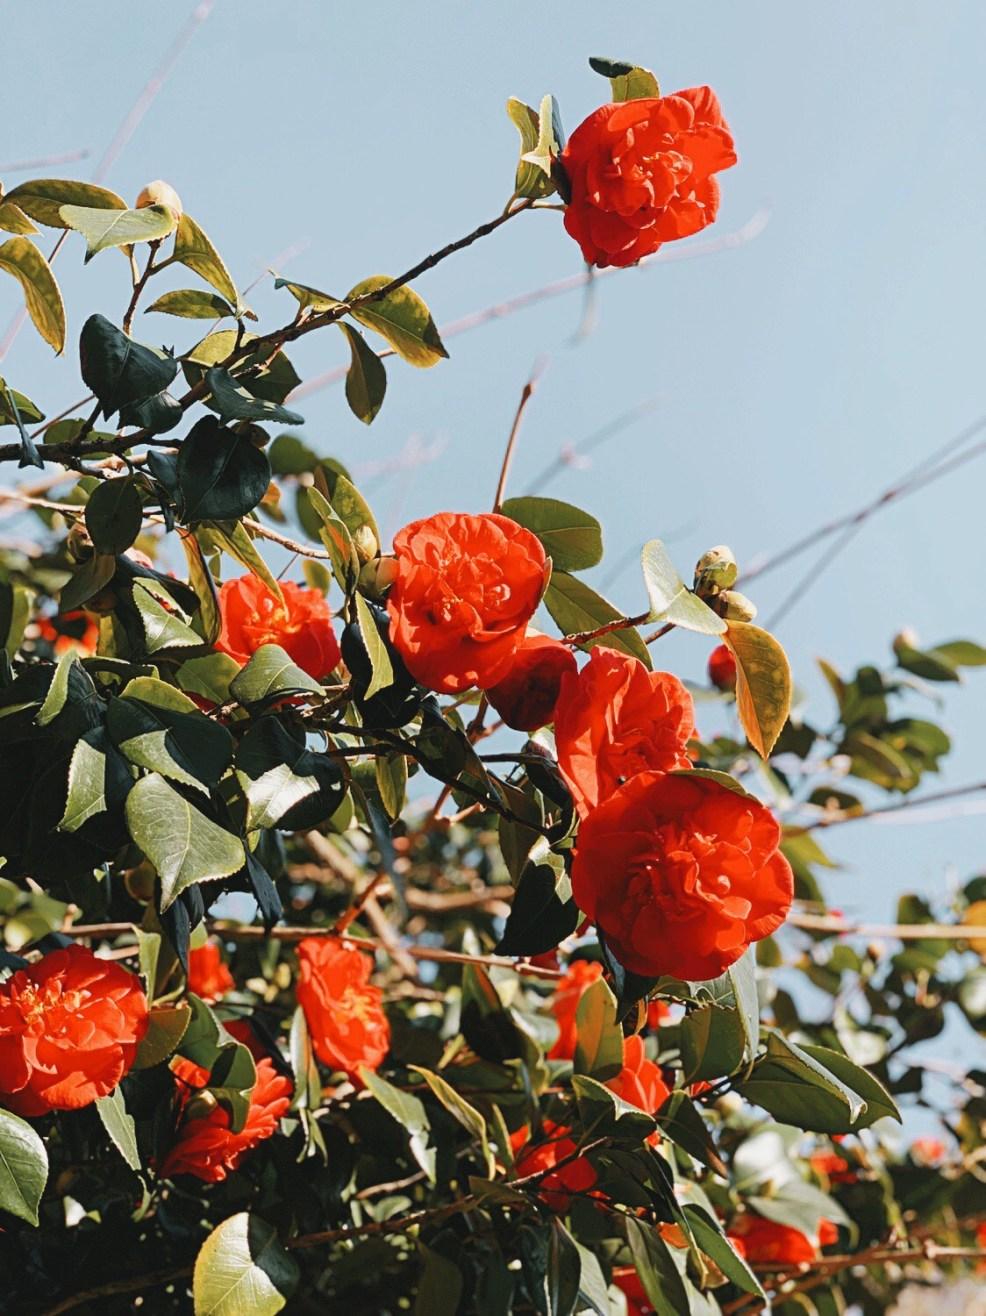 Jaye rockett things worth photographing spring bush blooming